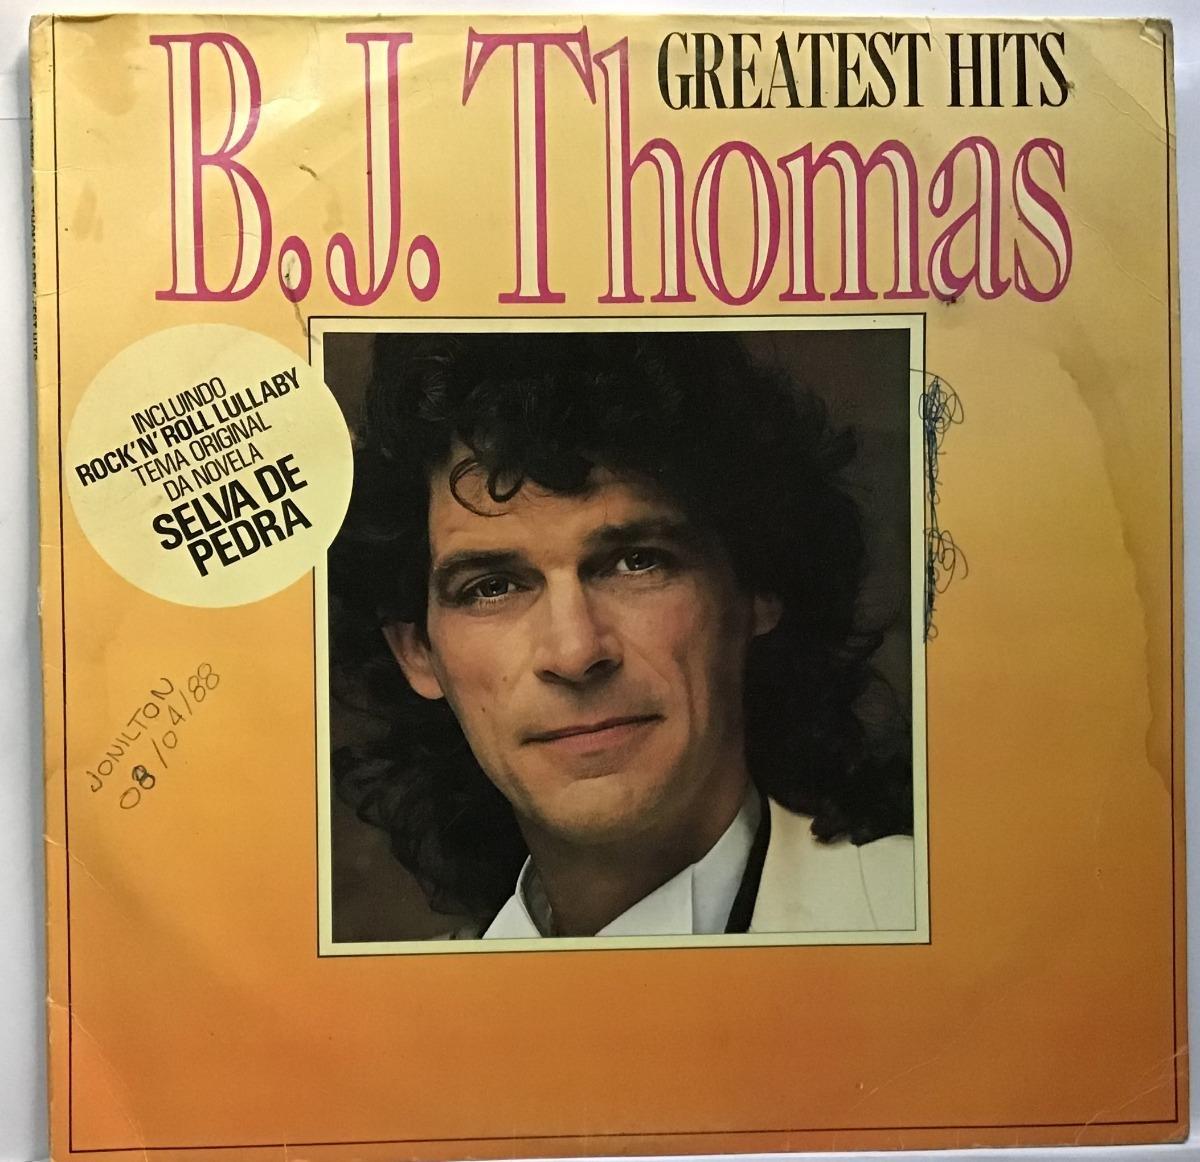 Lp B j  Thomas - Greatest Hits - Rock'n' Roll Lullaby -